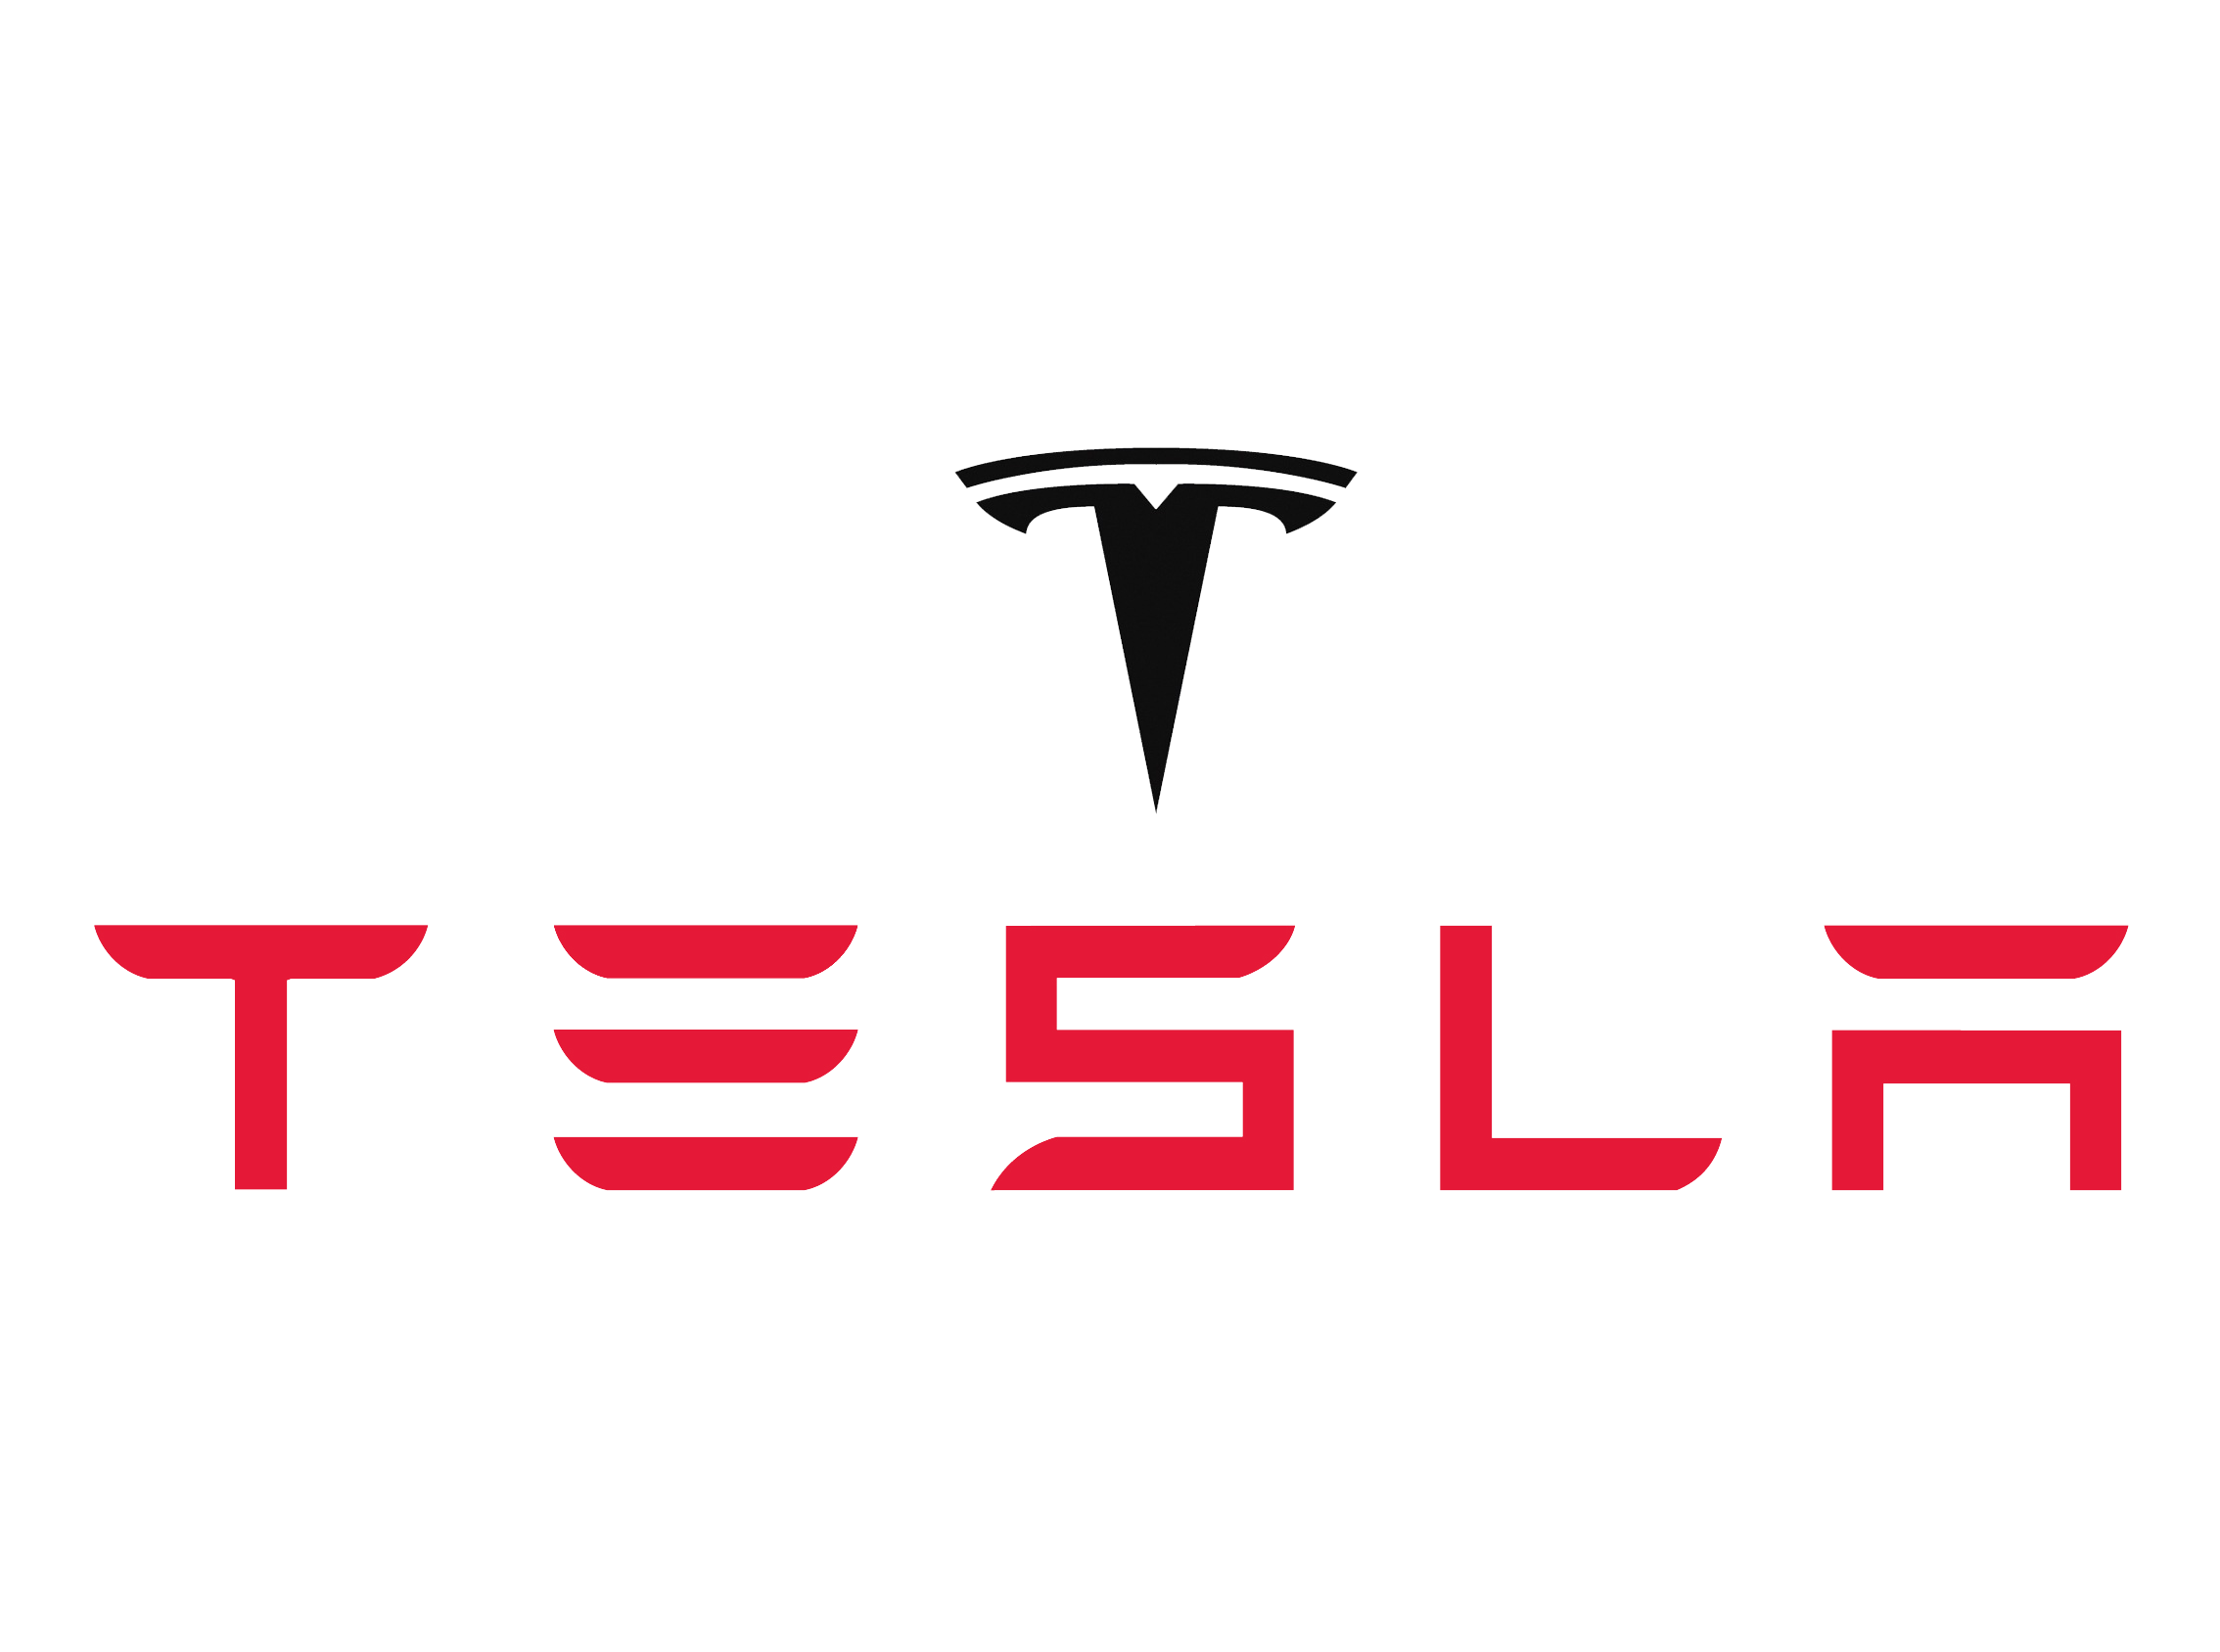 TeslaMotorssymbol Sams Thoughts - About tesla motors